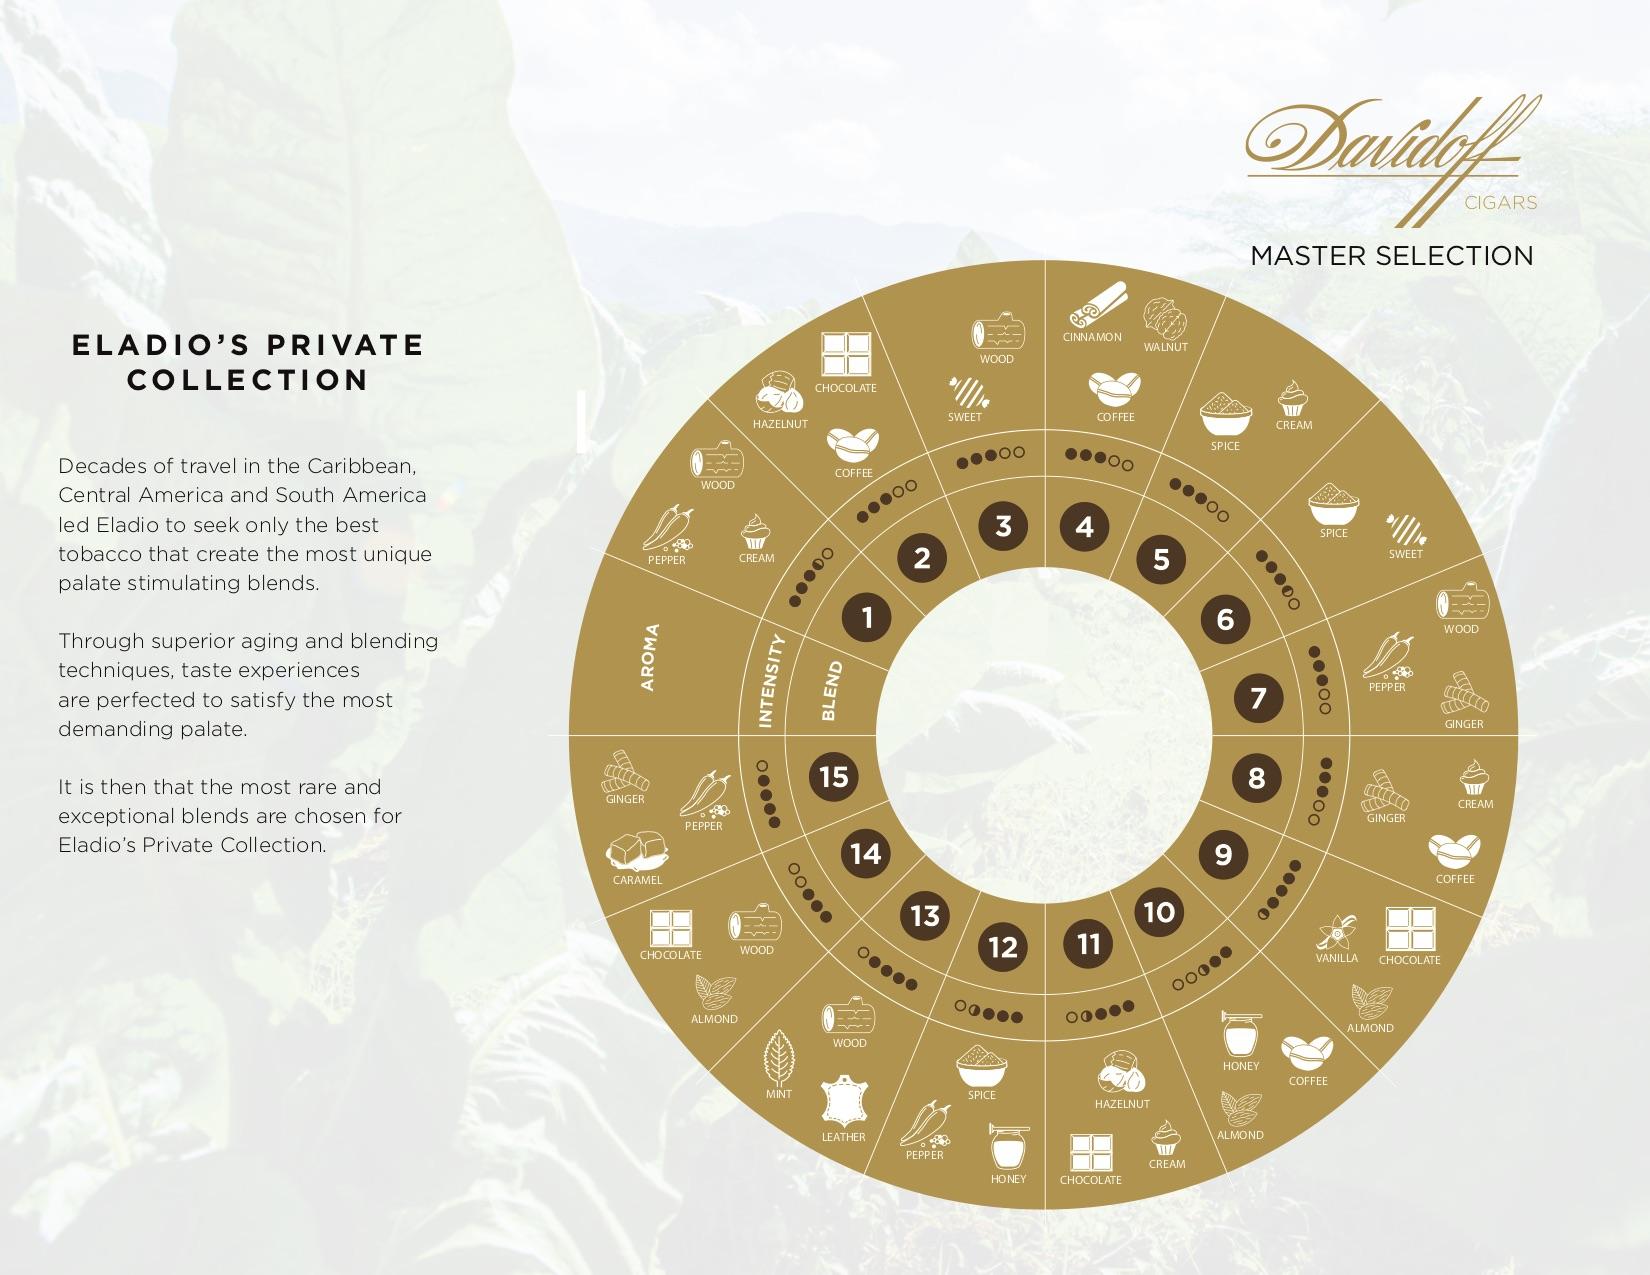 davidoff-master-blend-selection-series-wheel.jpg